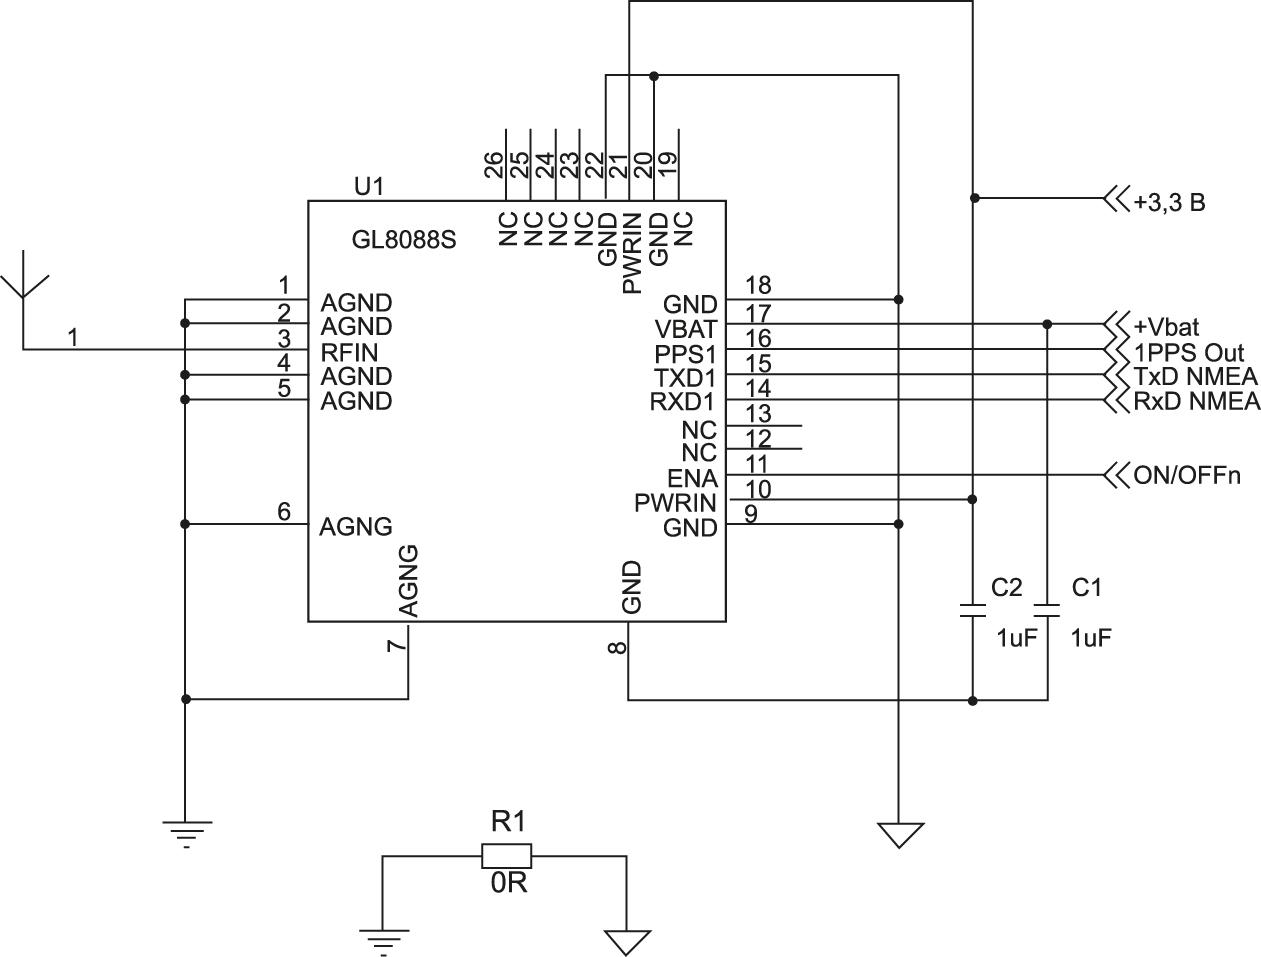 Типовая схема включения приемника GL8088s